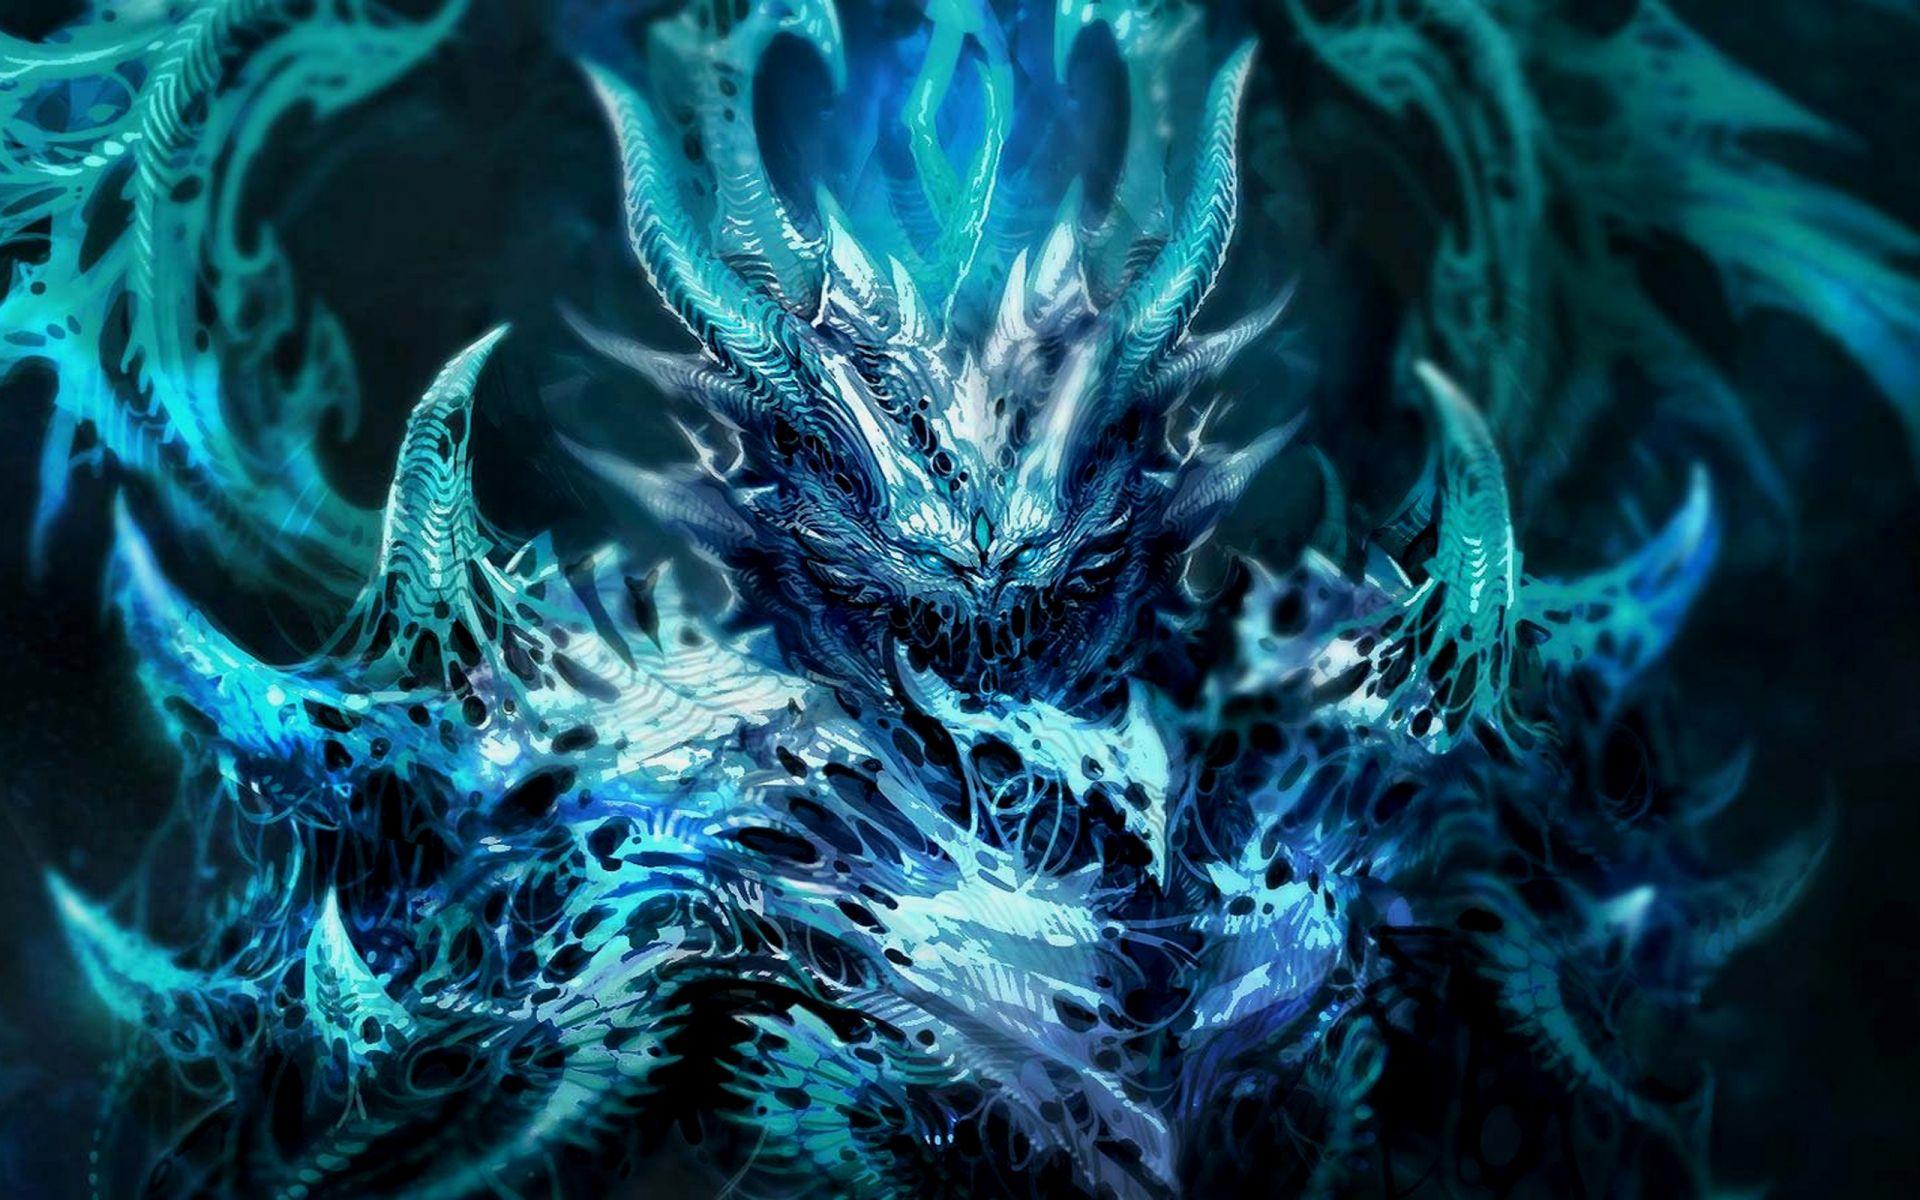 Dark Fantasy Demon Satan Angel Monster Creature 3d Magic Horns Blue Art Evil Wallpaper 1920x1200 27836 Wallpaperup Fantasy Demon Cool Dragons Dark Evil